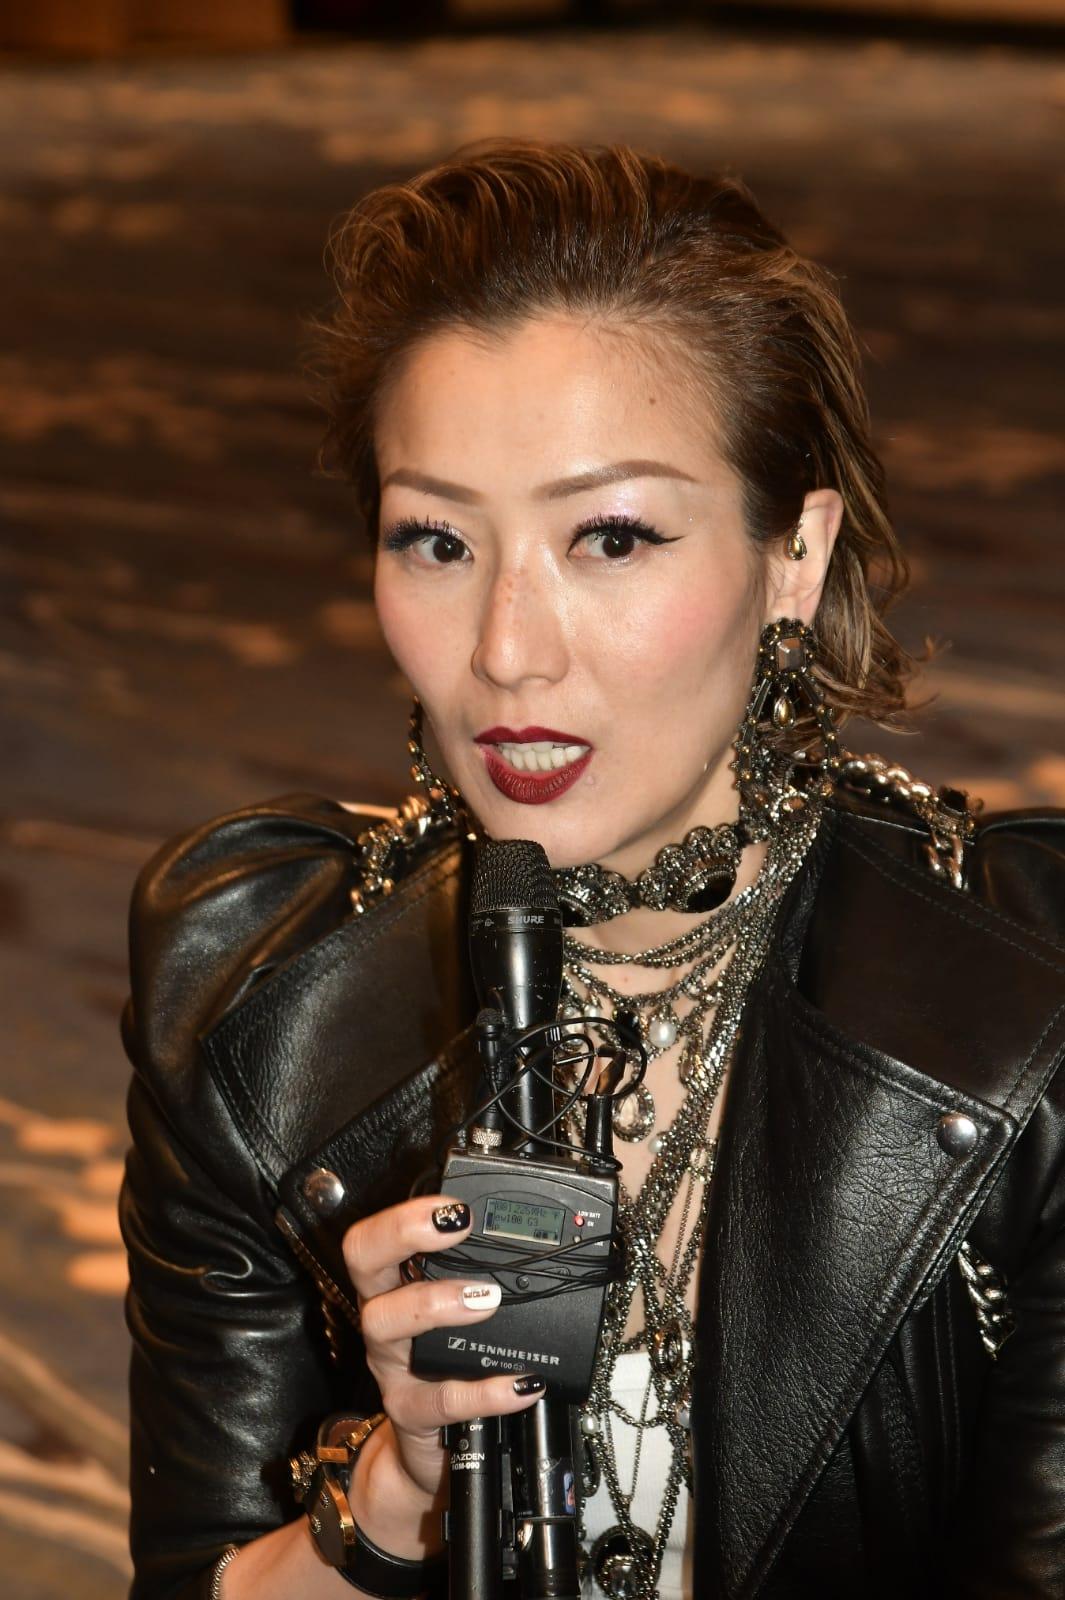 Sammi表示為個唱戒凍飲養聲。